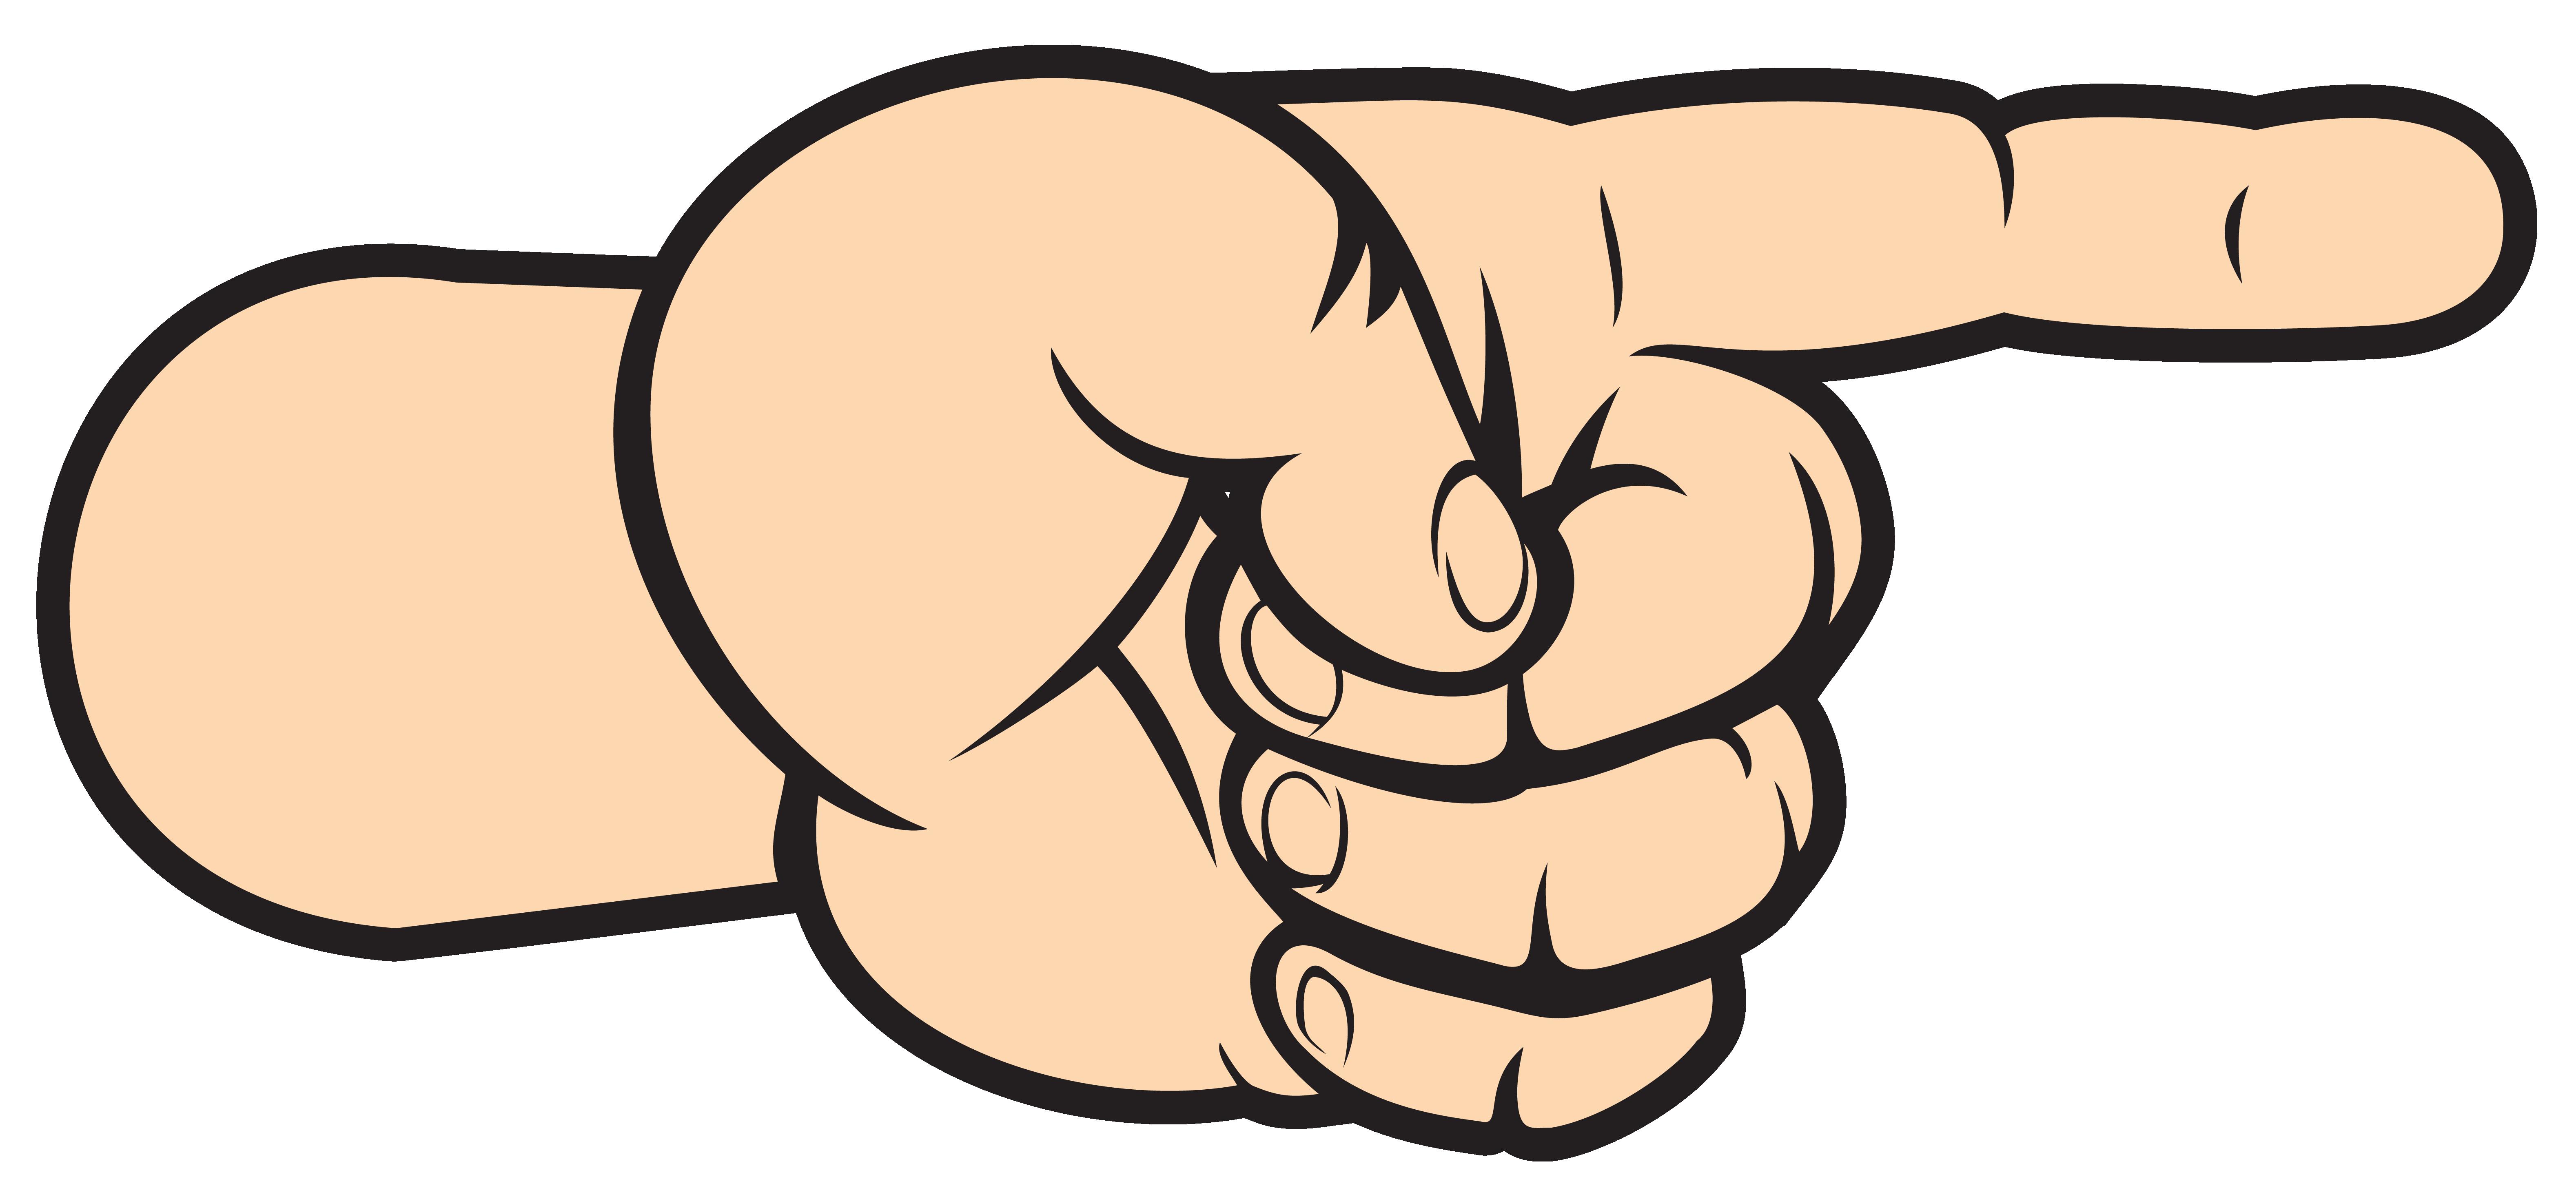 Right Hand Arrow Transparent PNG Clip Art Image.